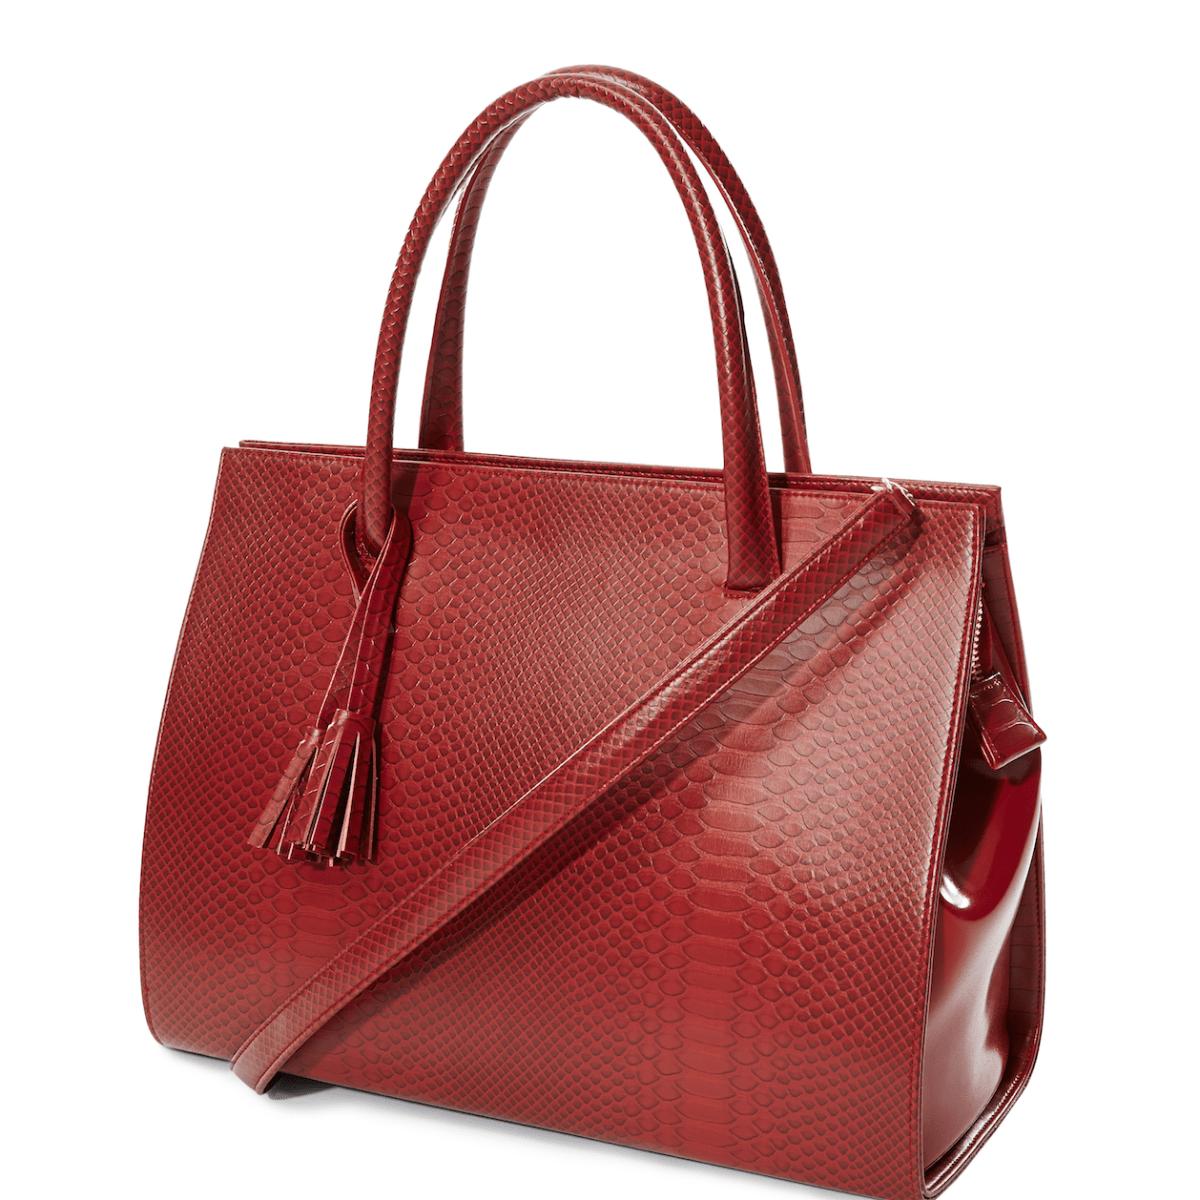 V'irkin bag, animal cruelty free alternative to Birkin bag